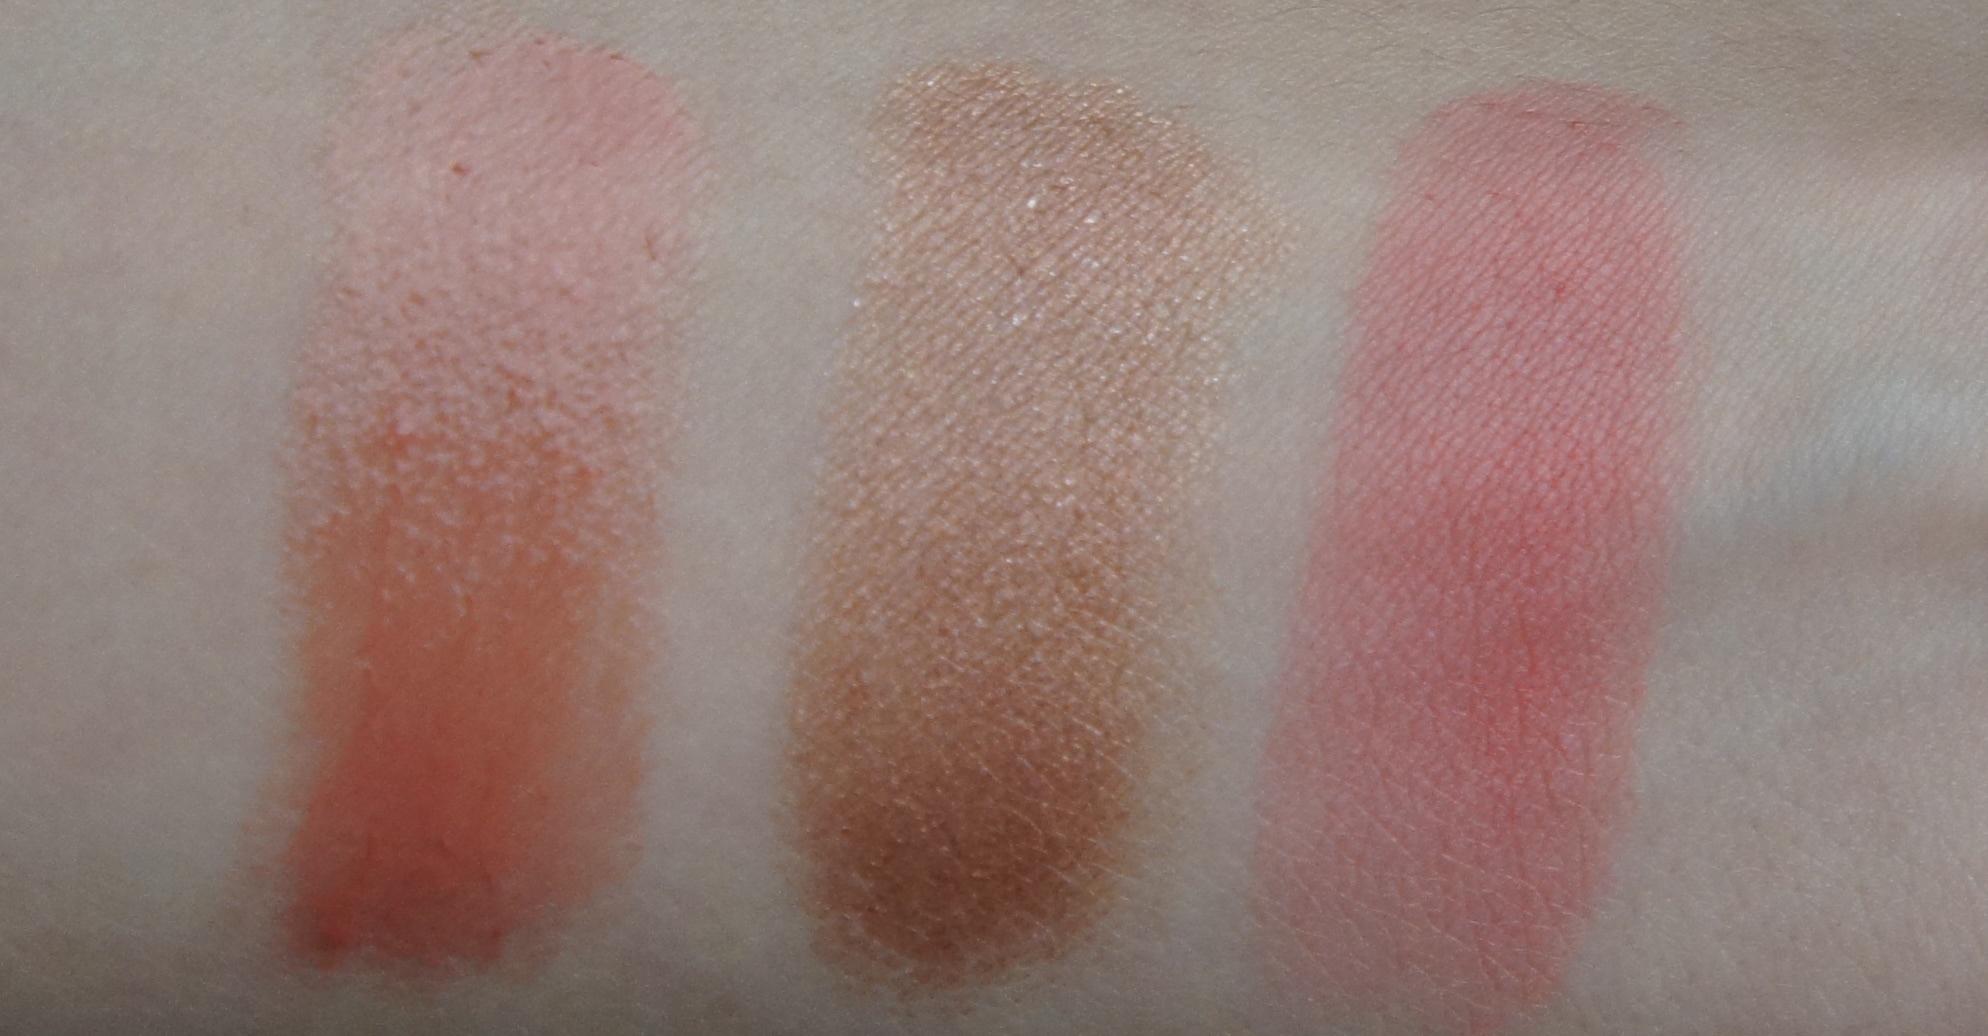 Sonia KashukShine Luxe Sheer Lip Colour (Nirvana),Sonia KashukSahara Sunset Bronzing Blush Stick (Marrakesh),Sonia KashukSahara Sunset Blusher (Casablanca)